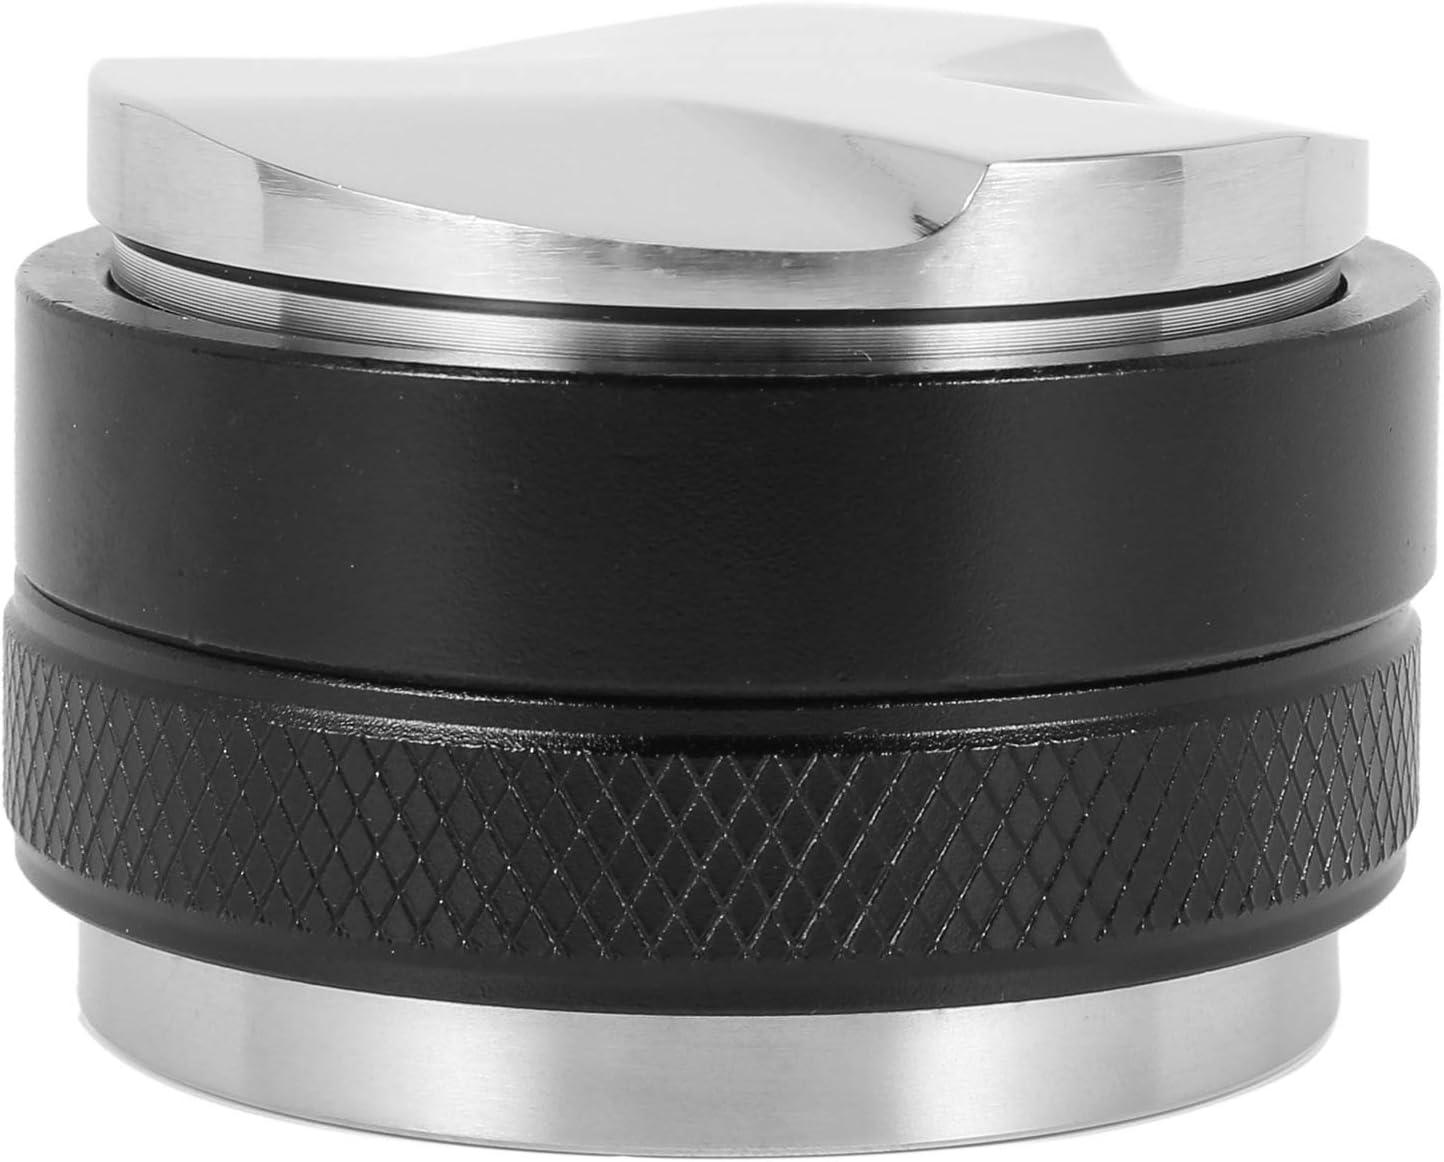 OVBBESS 5 popular Save money 51mm Espresso Tamper Distributor Coffee Dual Head Lev